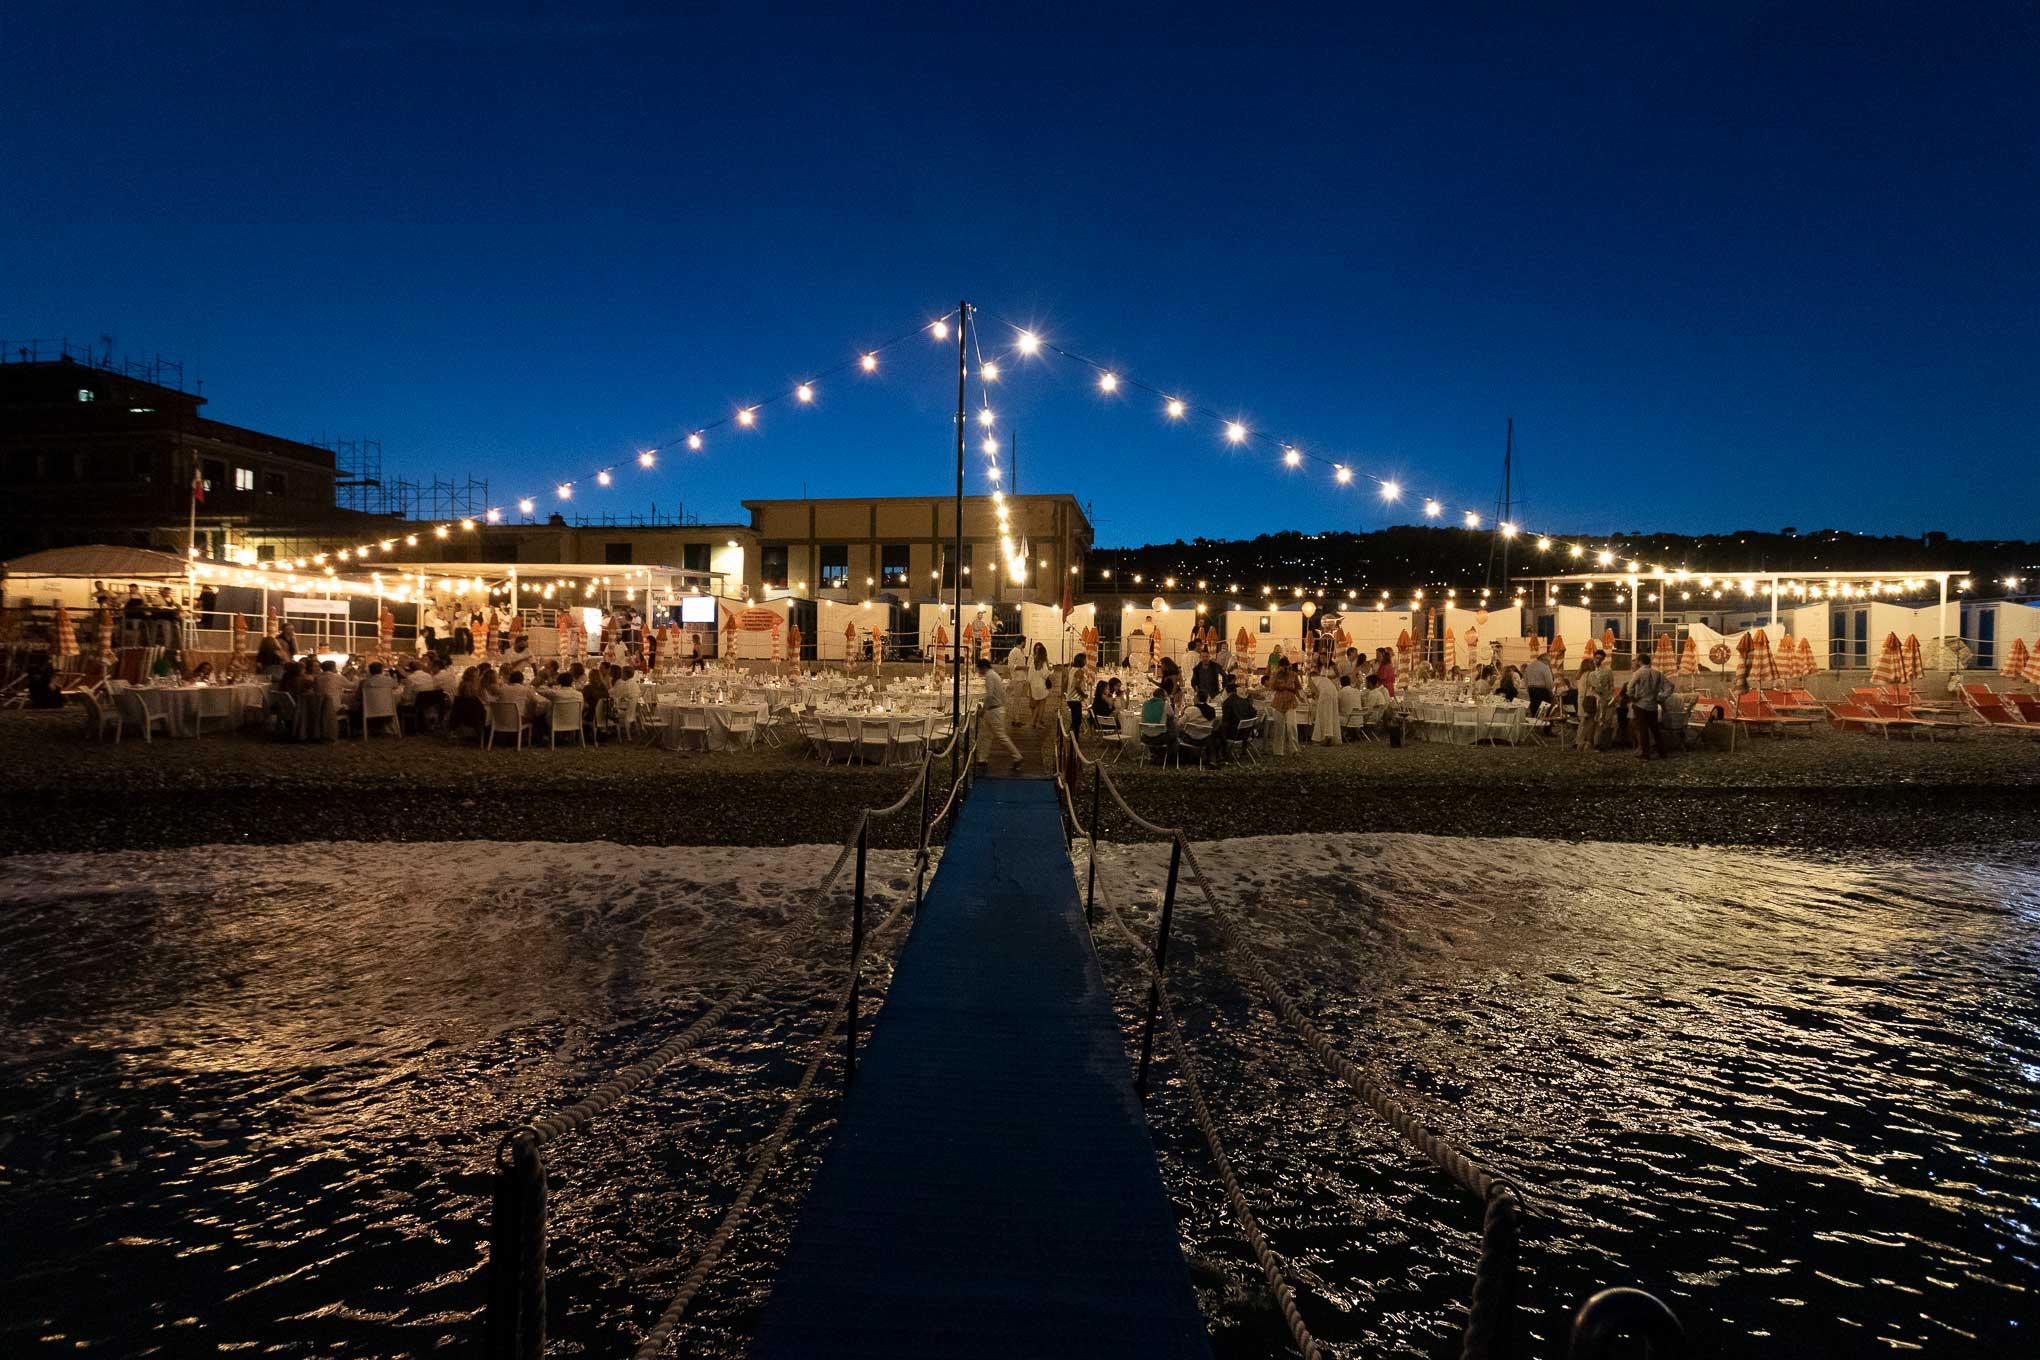 Bagni Sirena di sera, dal pontile